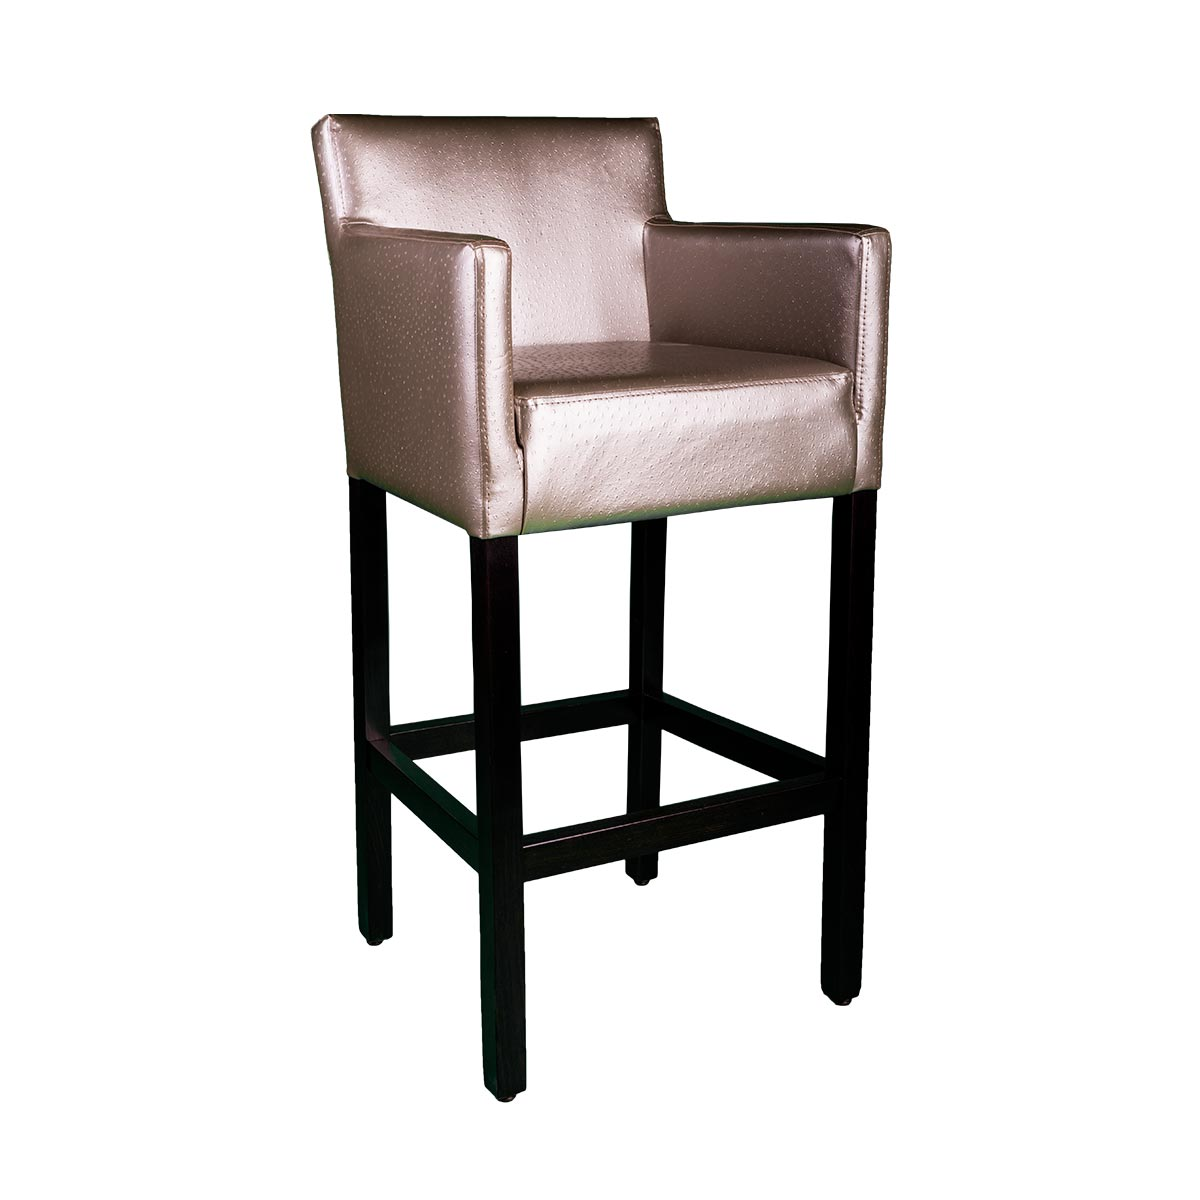 Vista Bar - Barske stolice sa rukonaslonom - Detal nameštaj